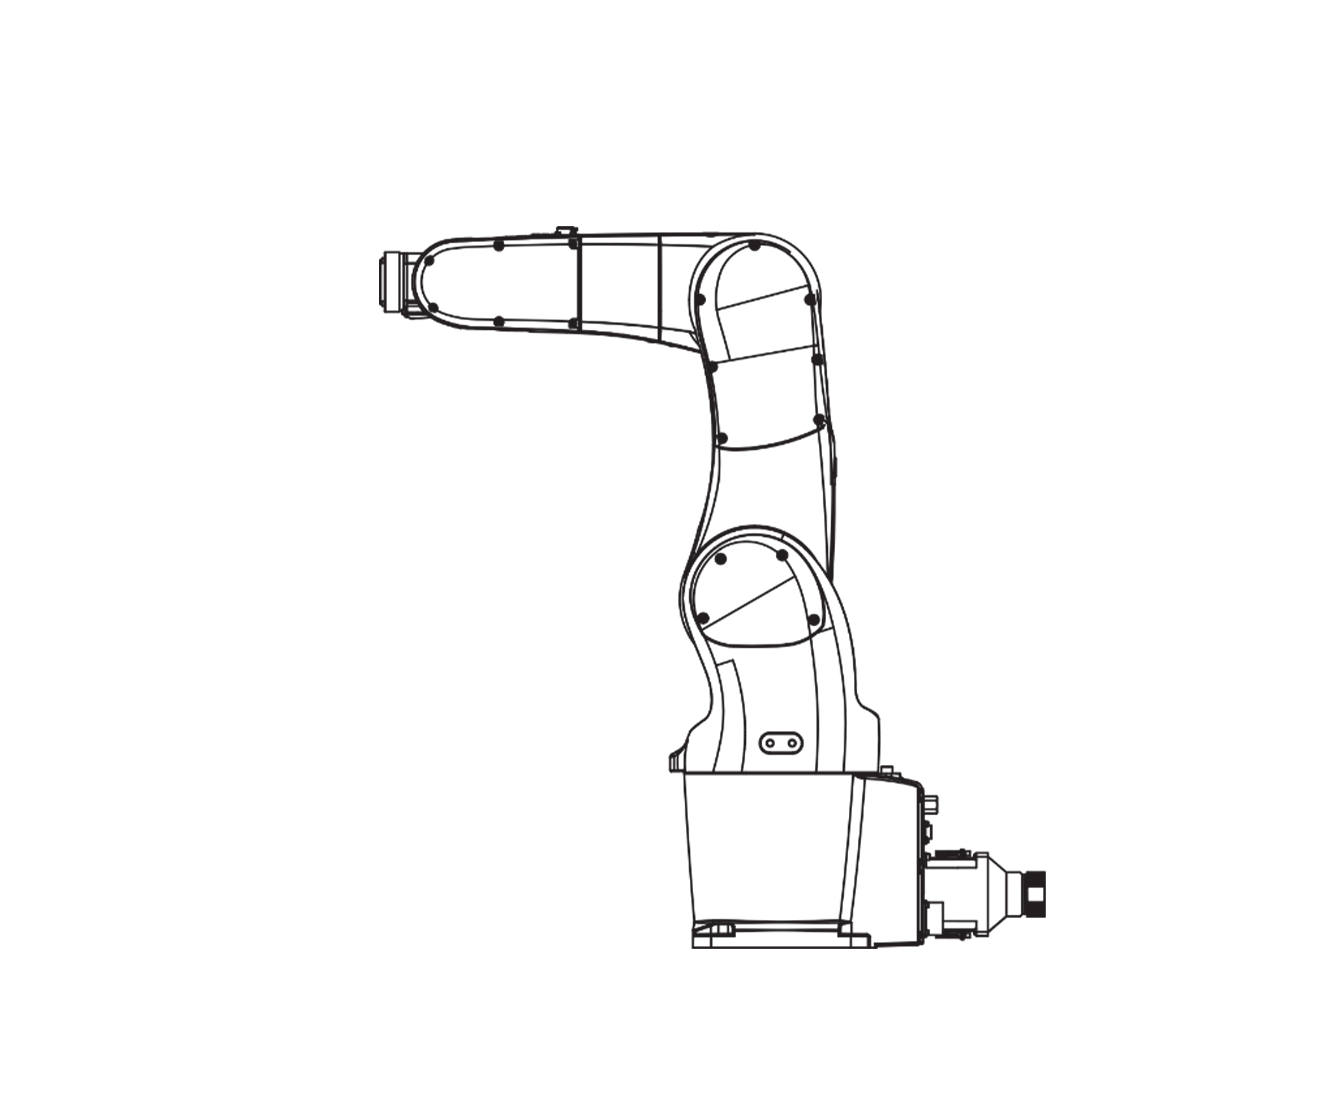 denso 6-axis robots vp series